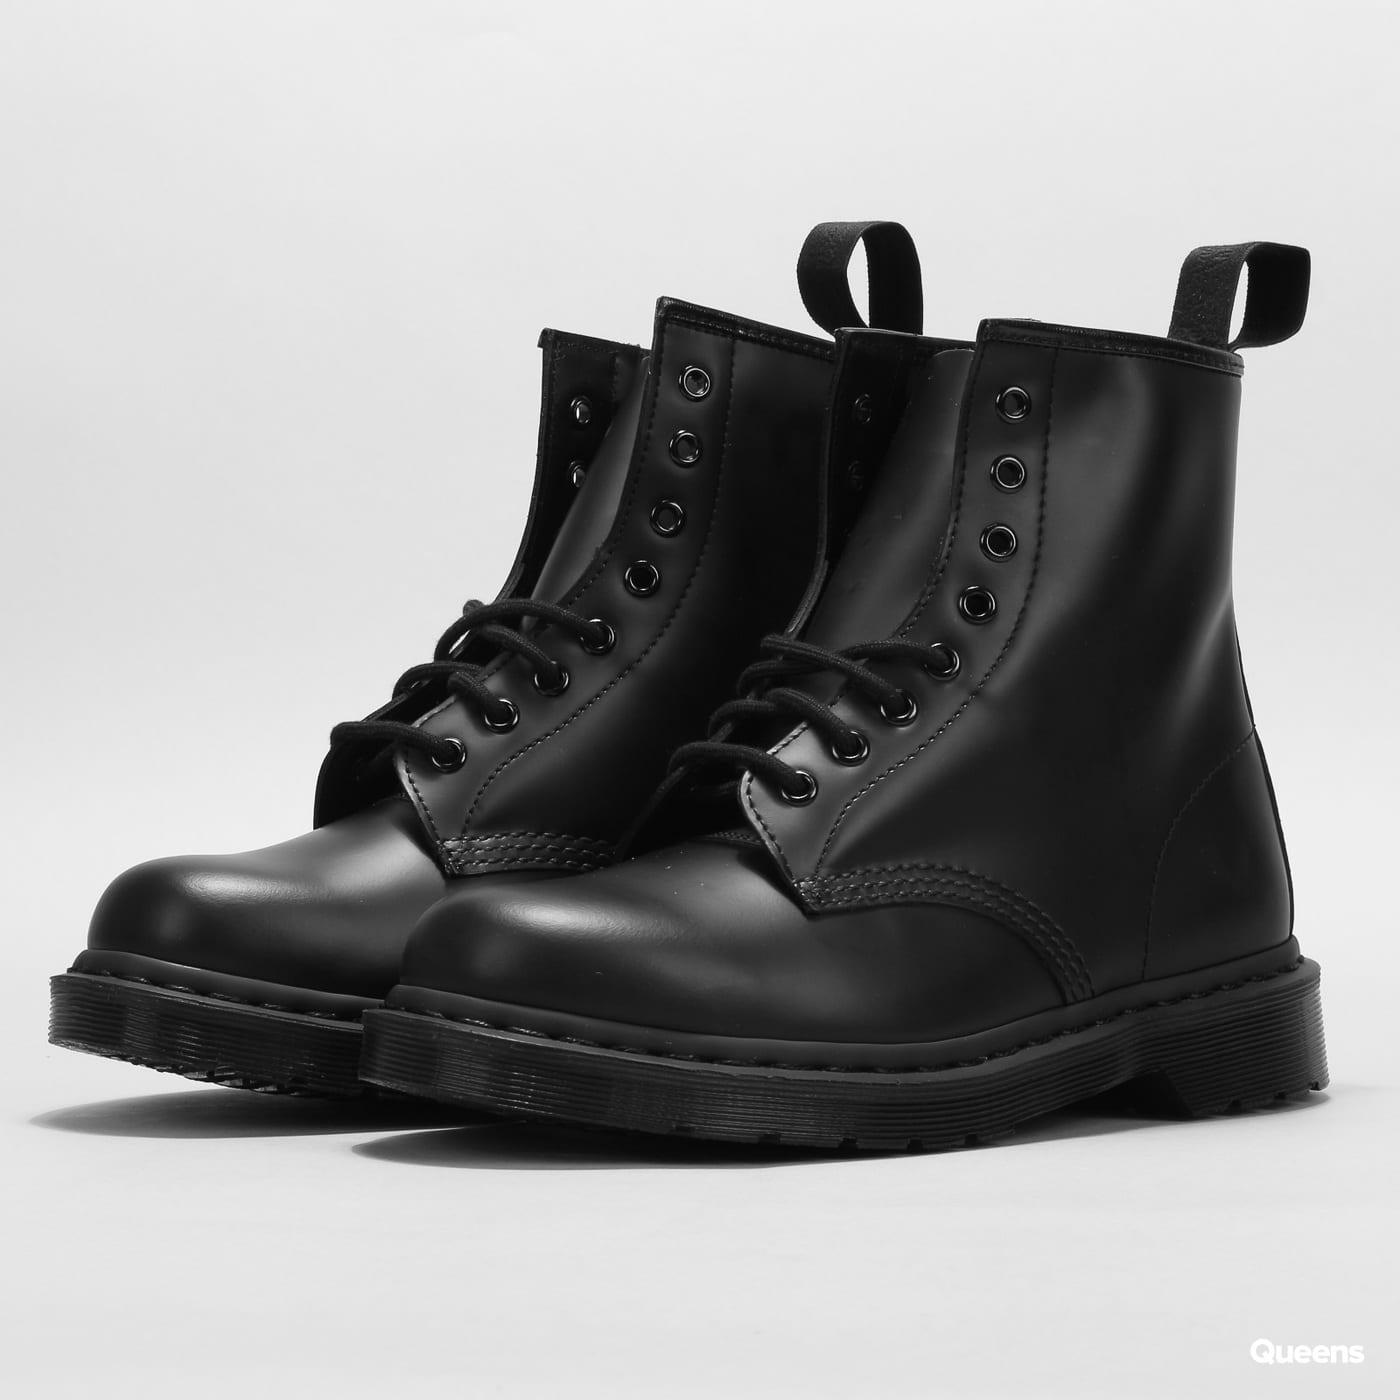 e87daa927e0 Pánské zimní boty Dr. Martens 1460 Mono (DM14353001) – Queens 💚